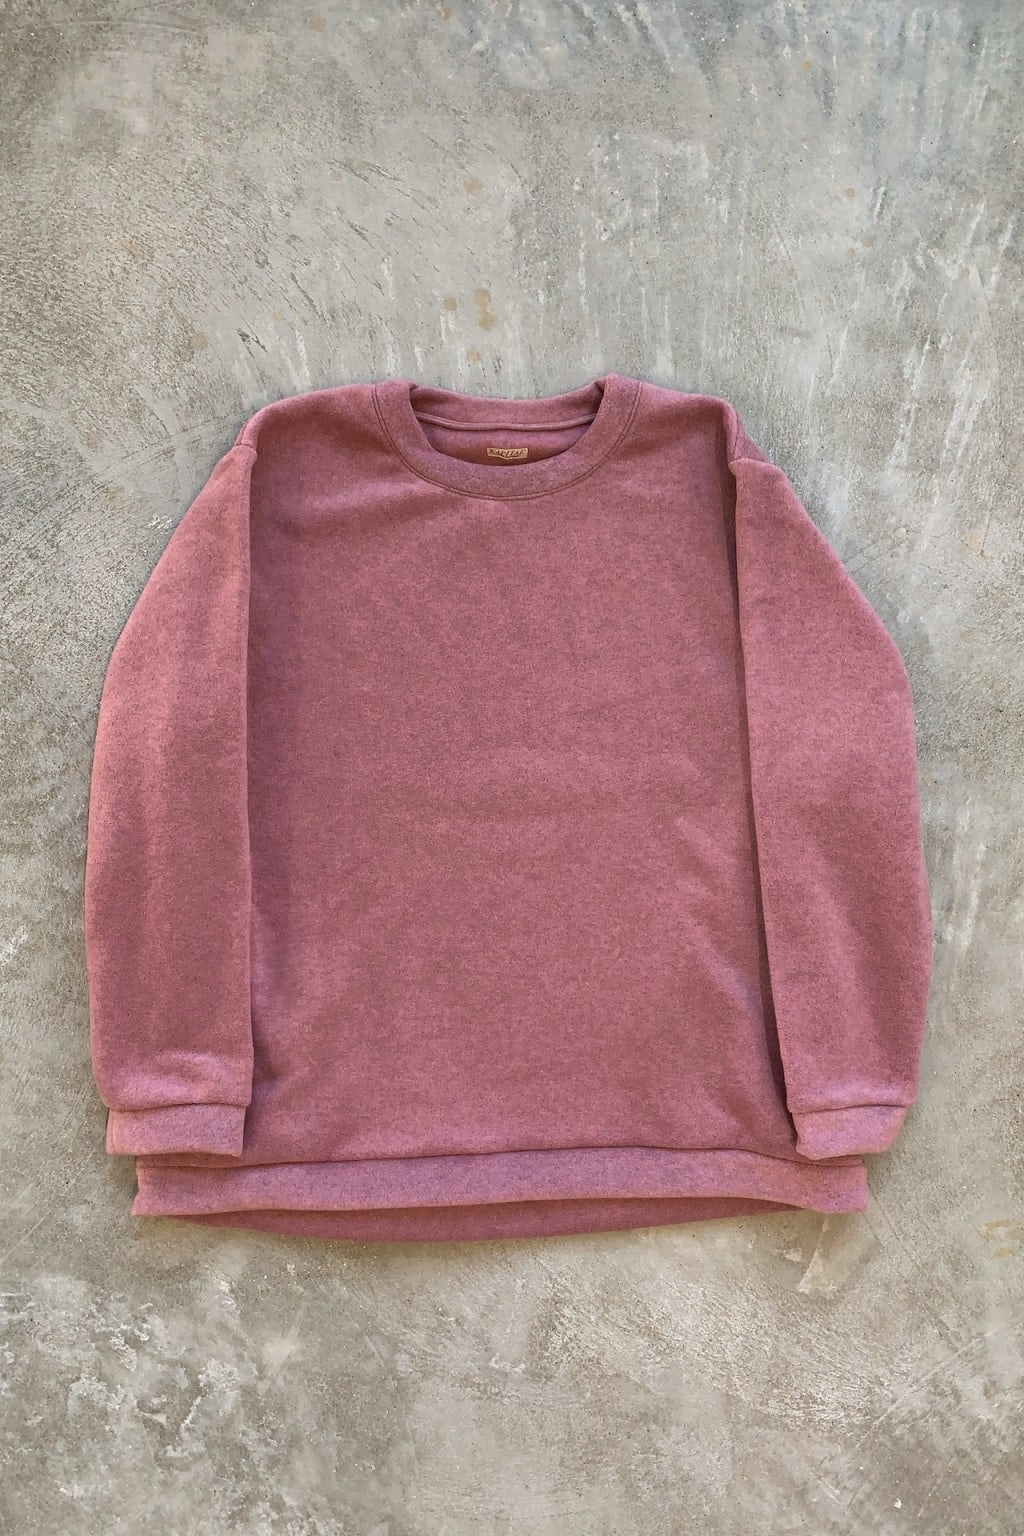 Kapital Reverse Fleece BIG Crew Sweat Shirt Pink